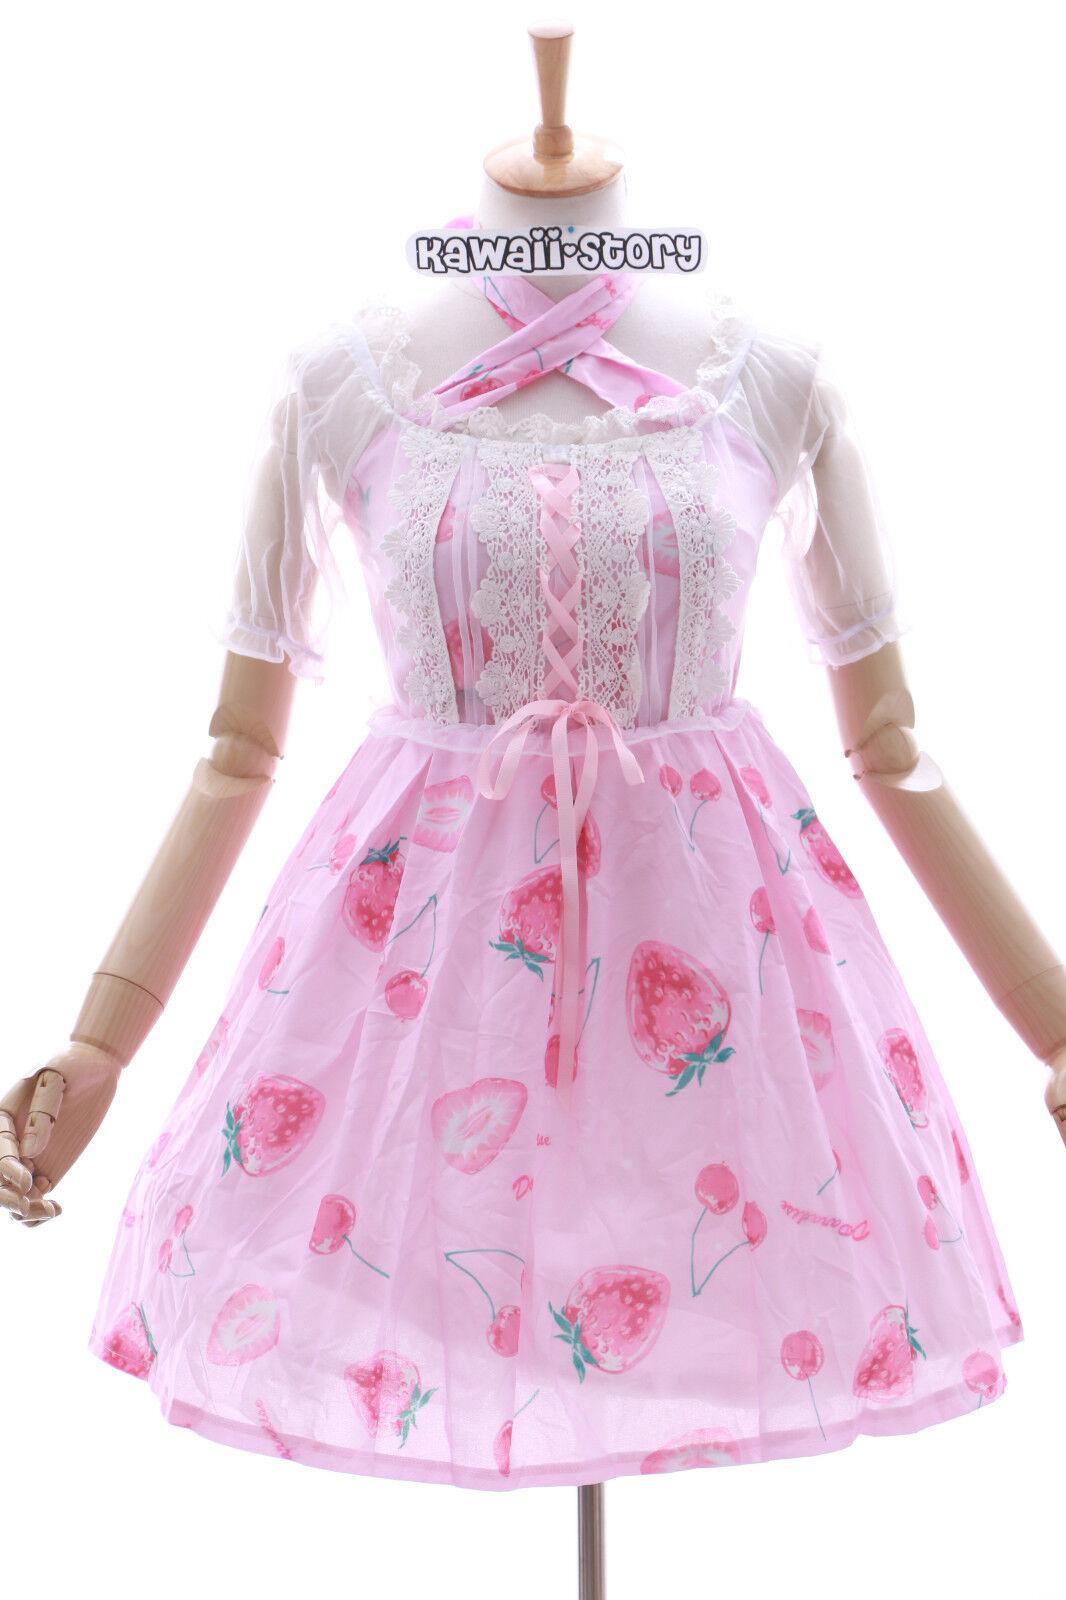 CB-01 Fraise FRAISE CERISE stretch rose rose rose robe lolita gothique costume cosplay 572717